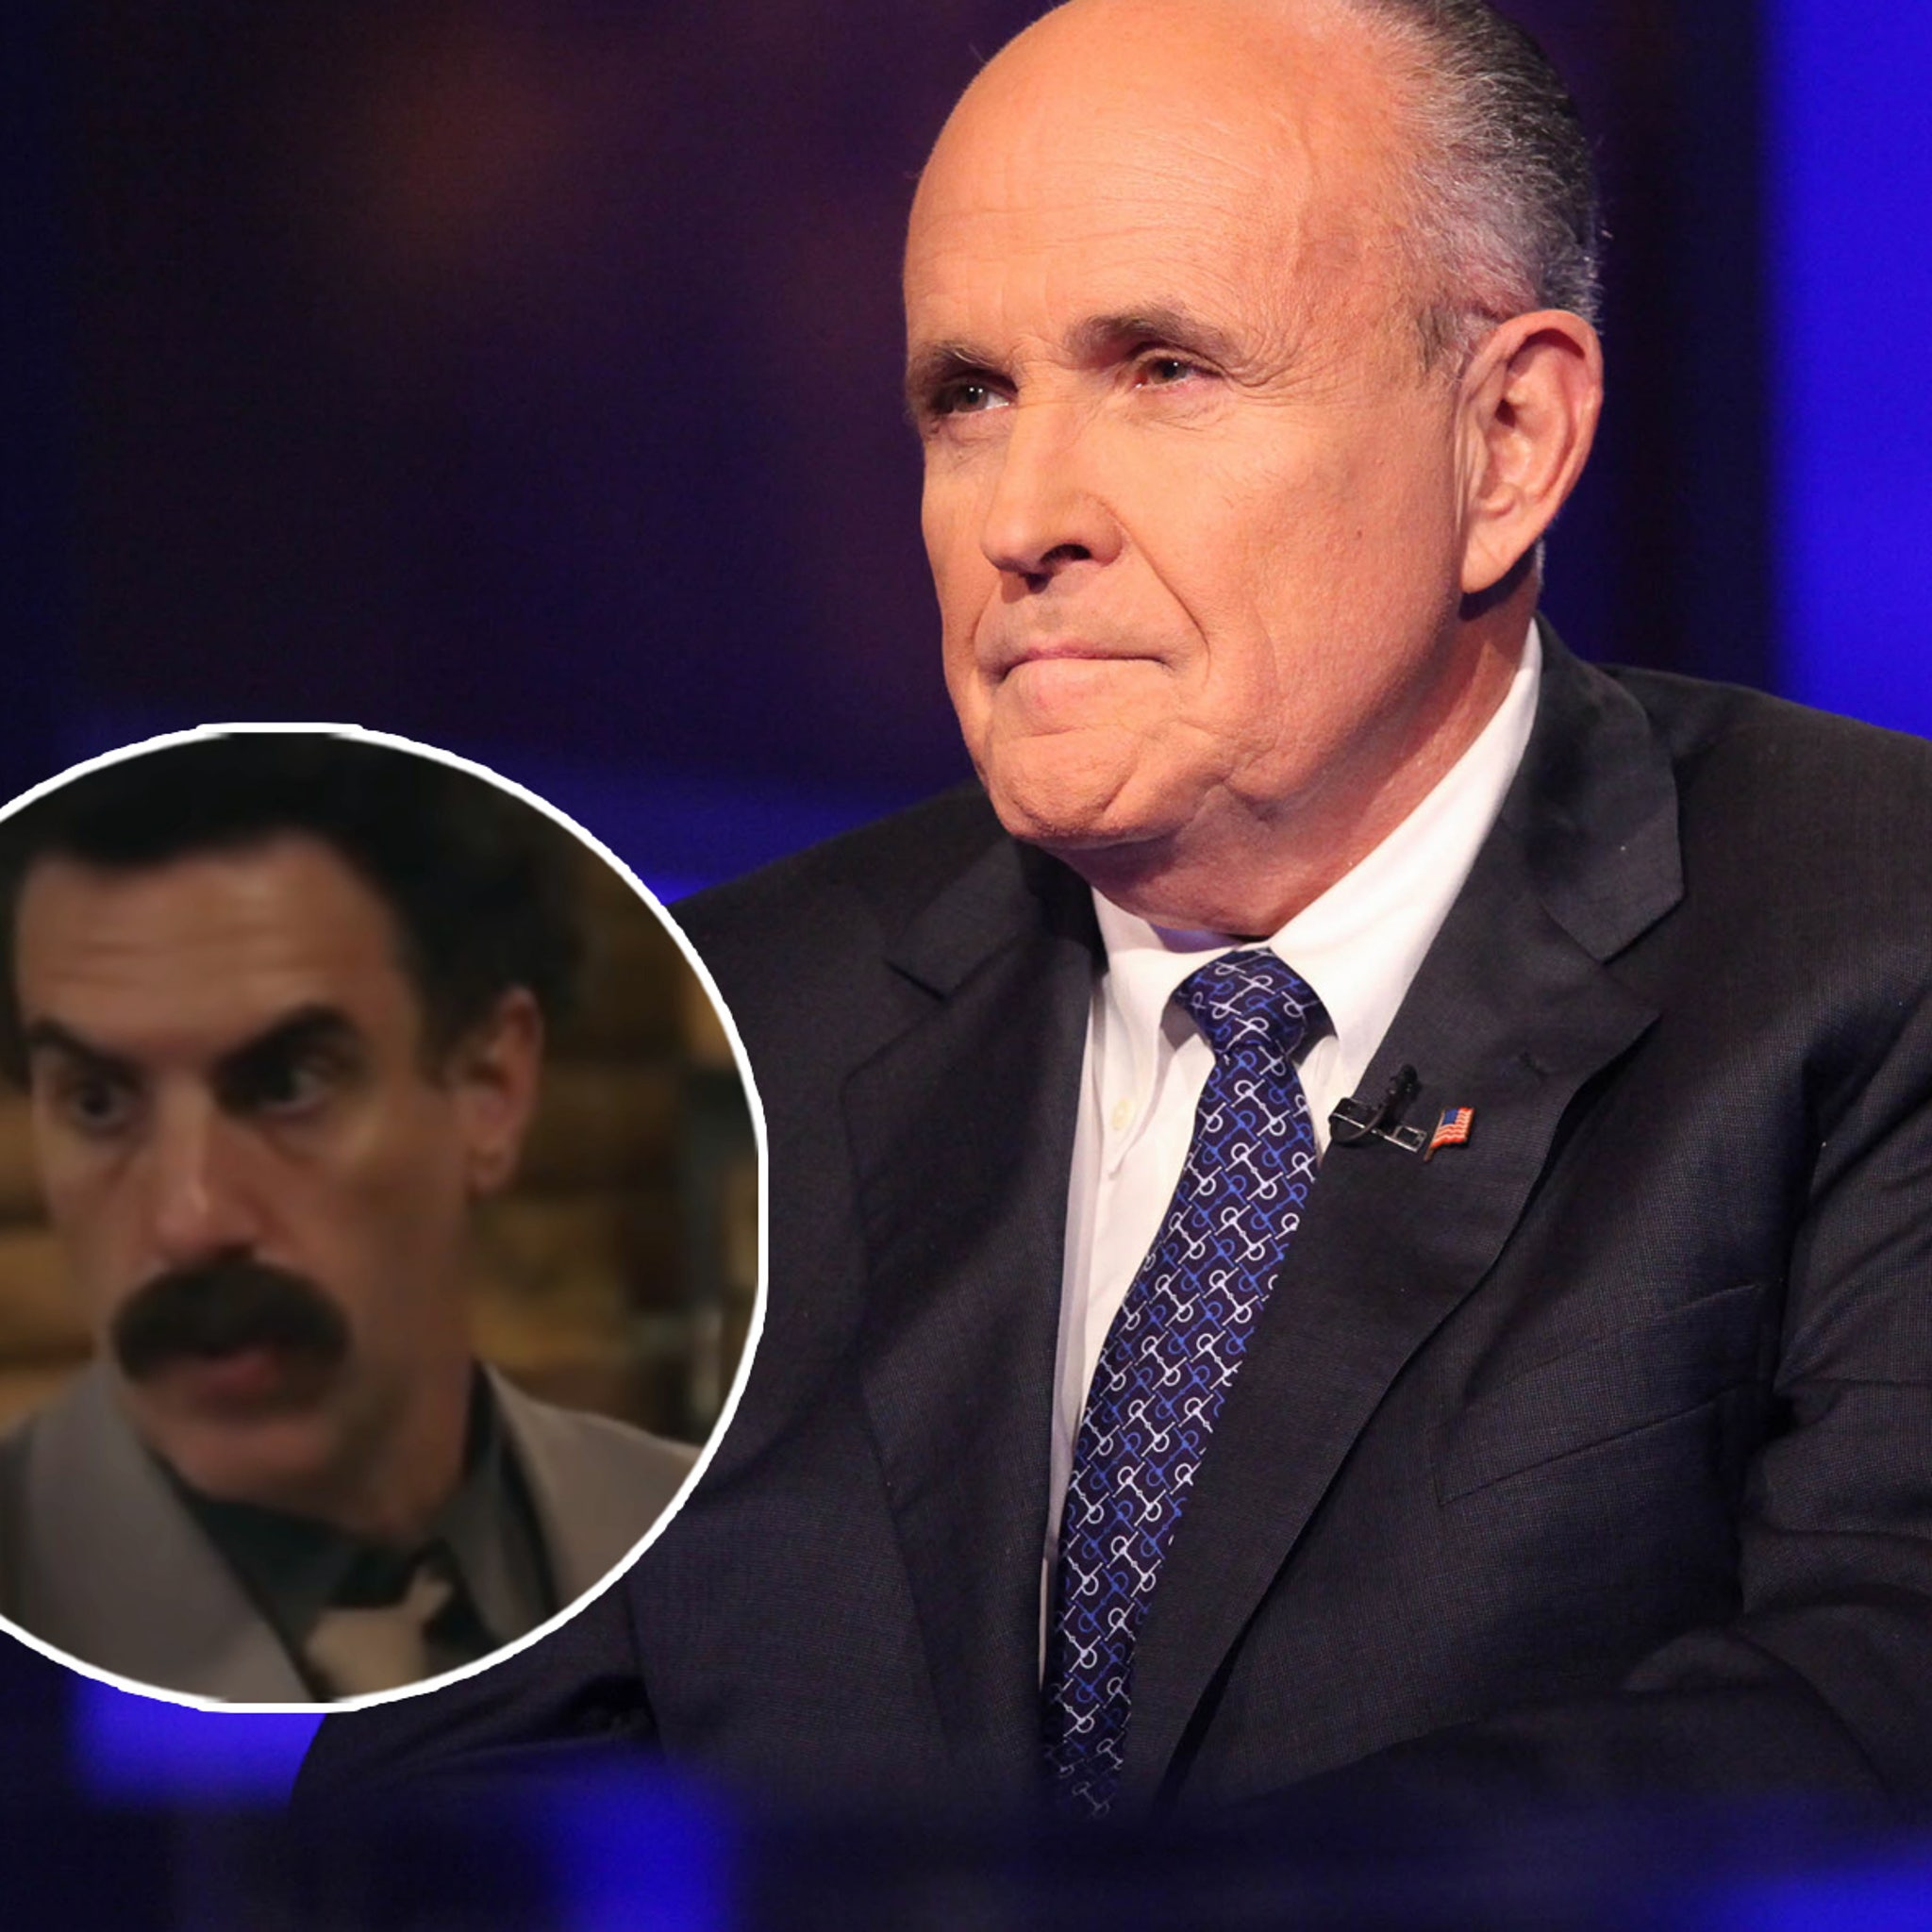 Twitter Reacts to Rudy Giuliani's VERY Awkward Scene in Borat Sequel